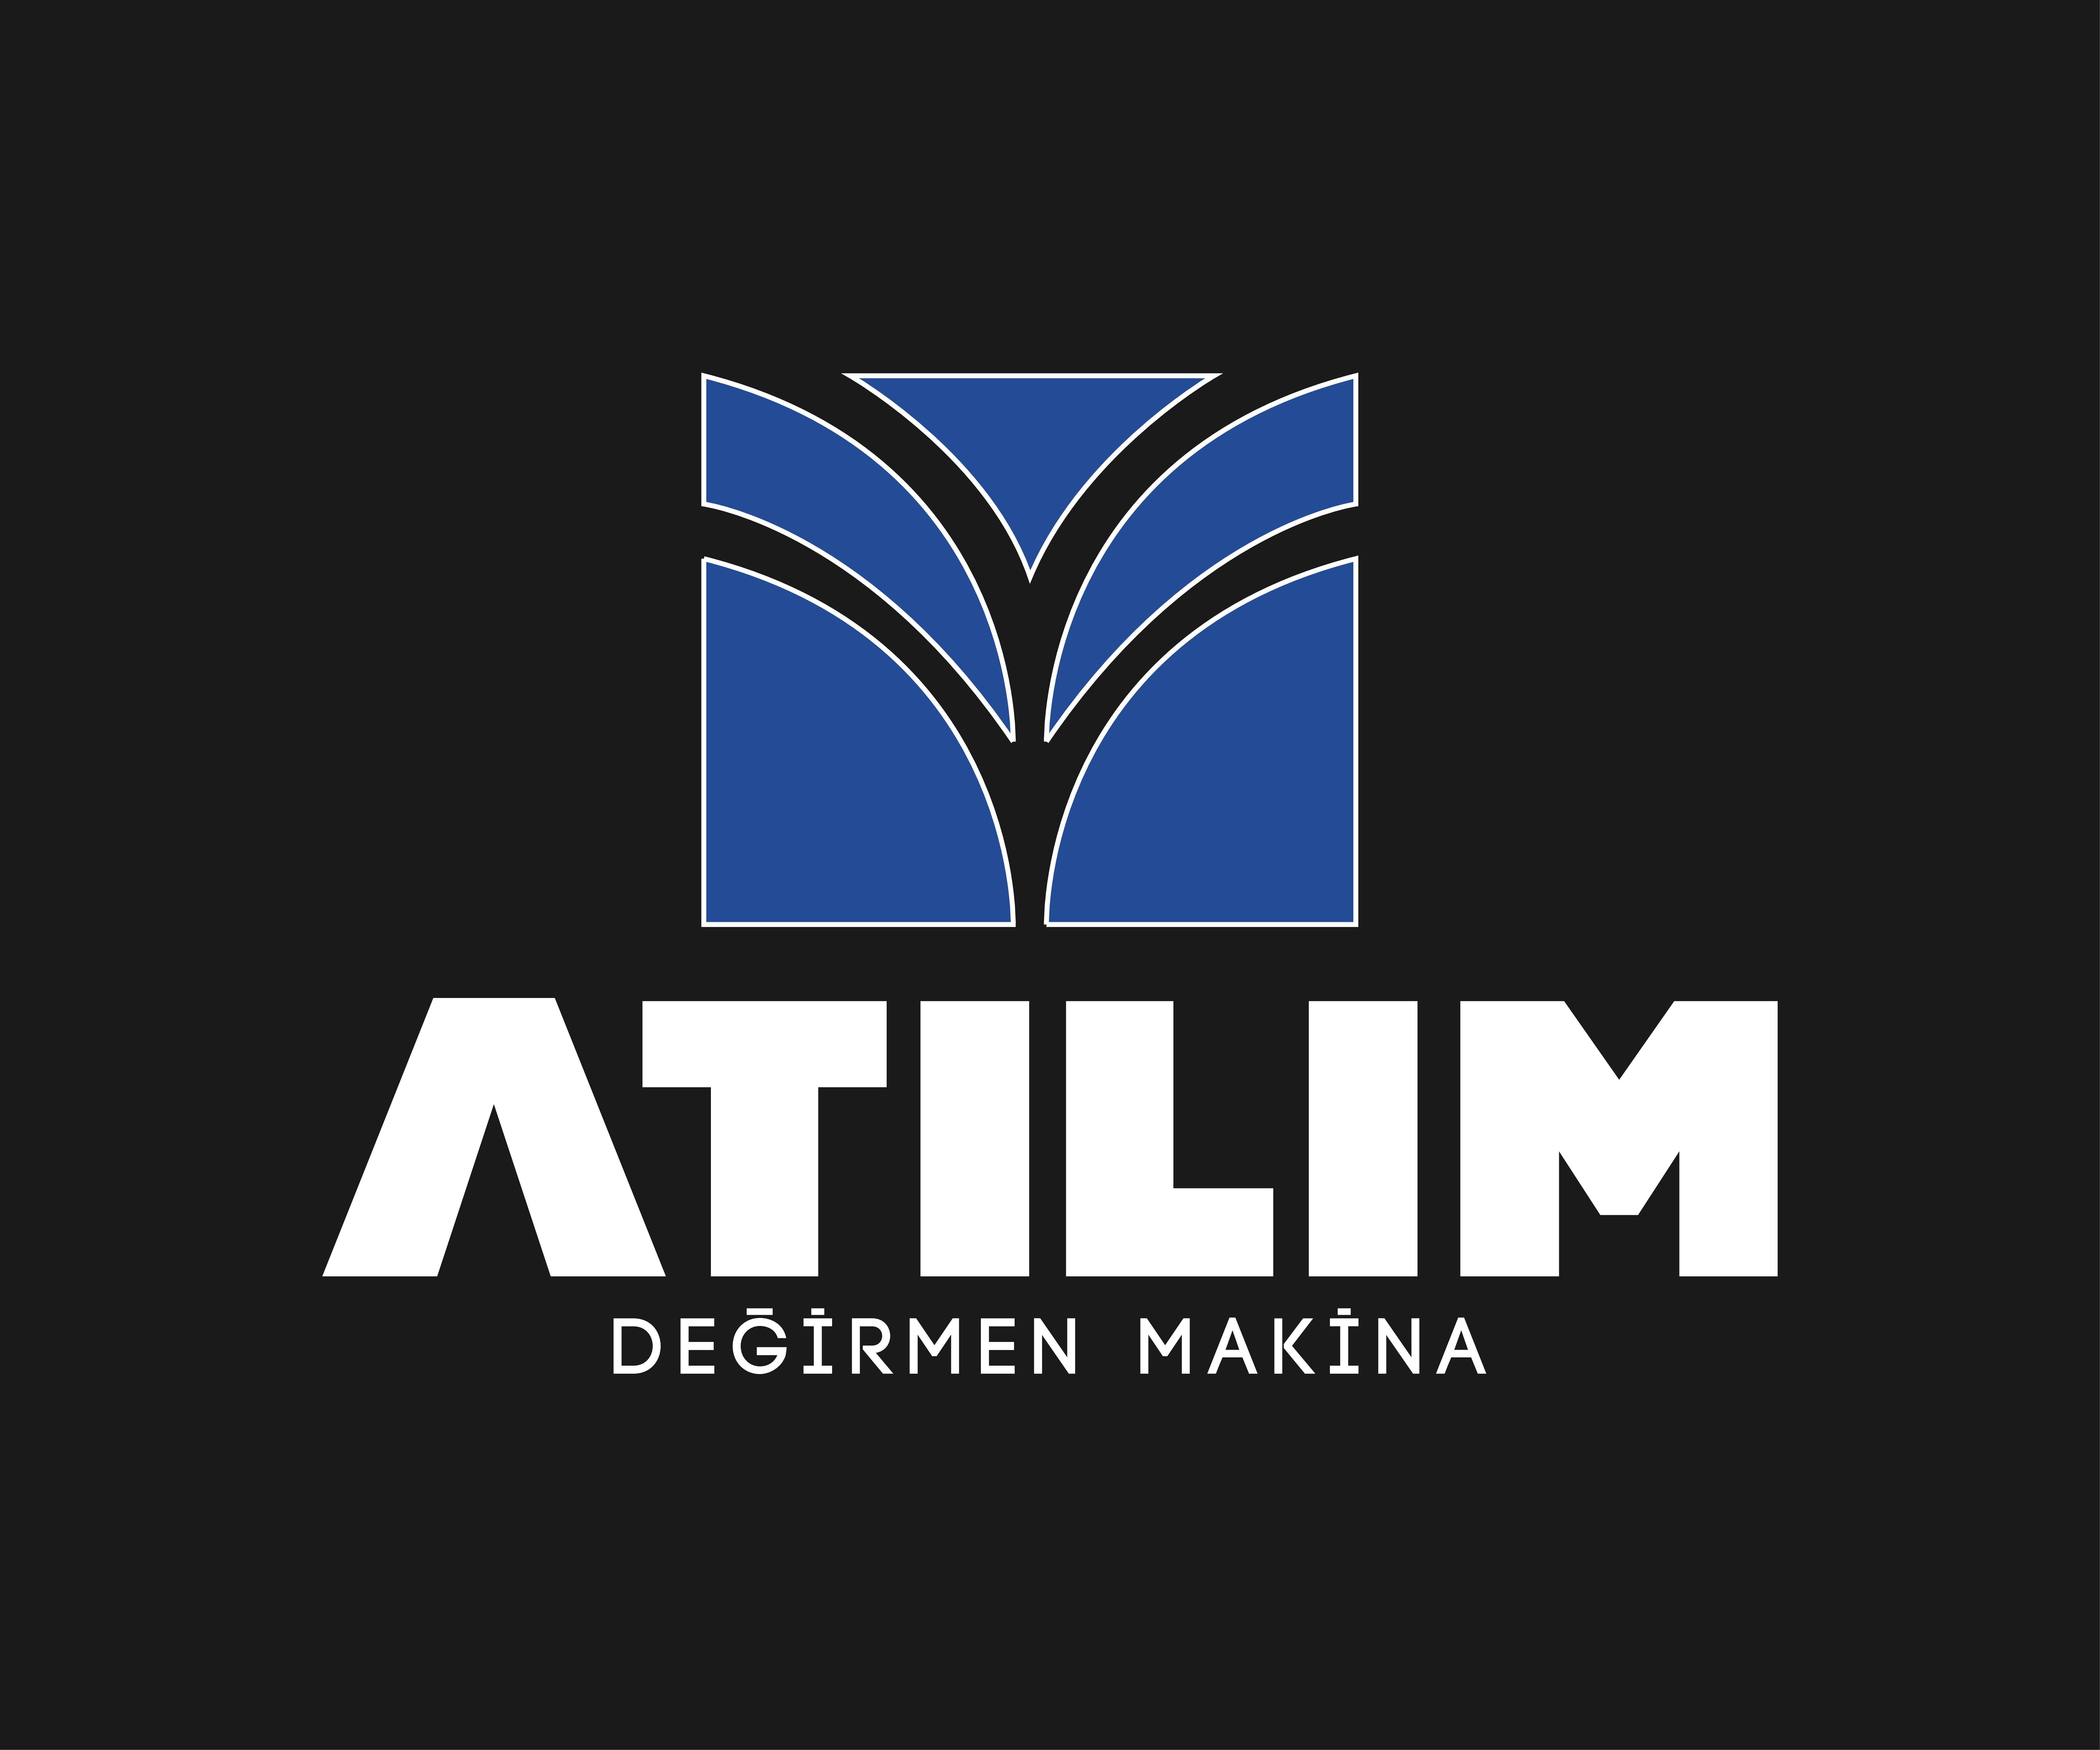 ATILIM DEGIRMEN LTD. STI.